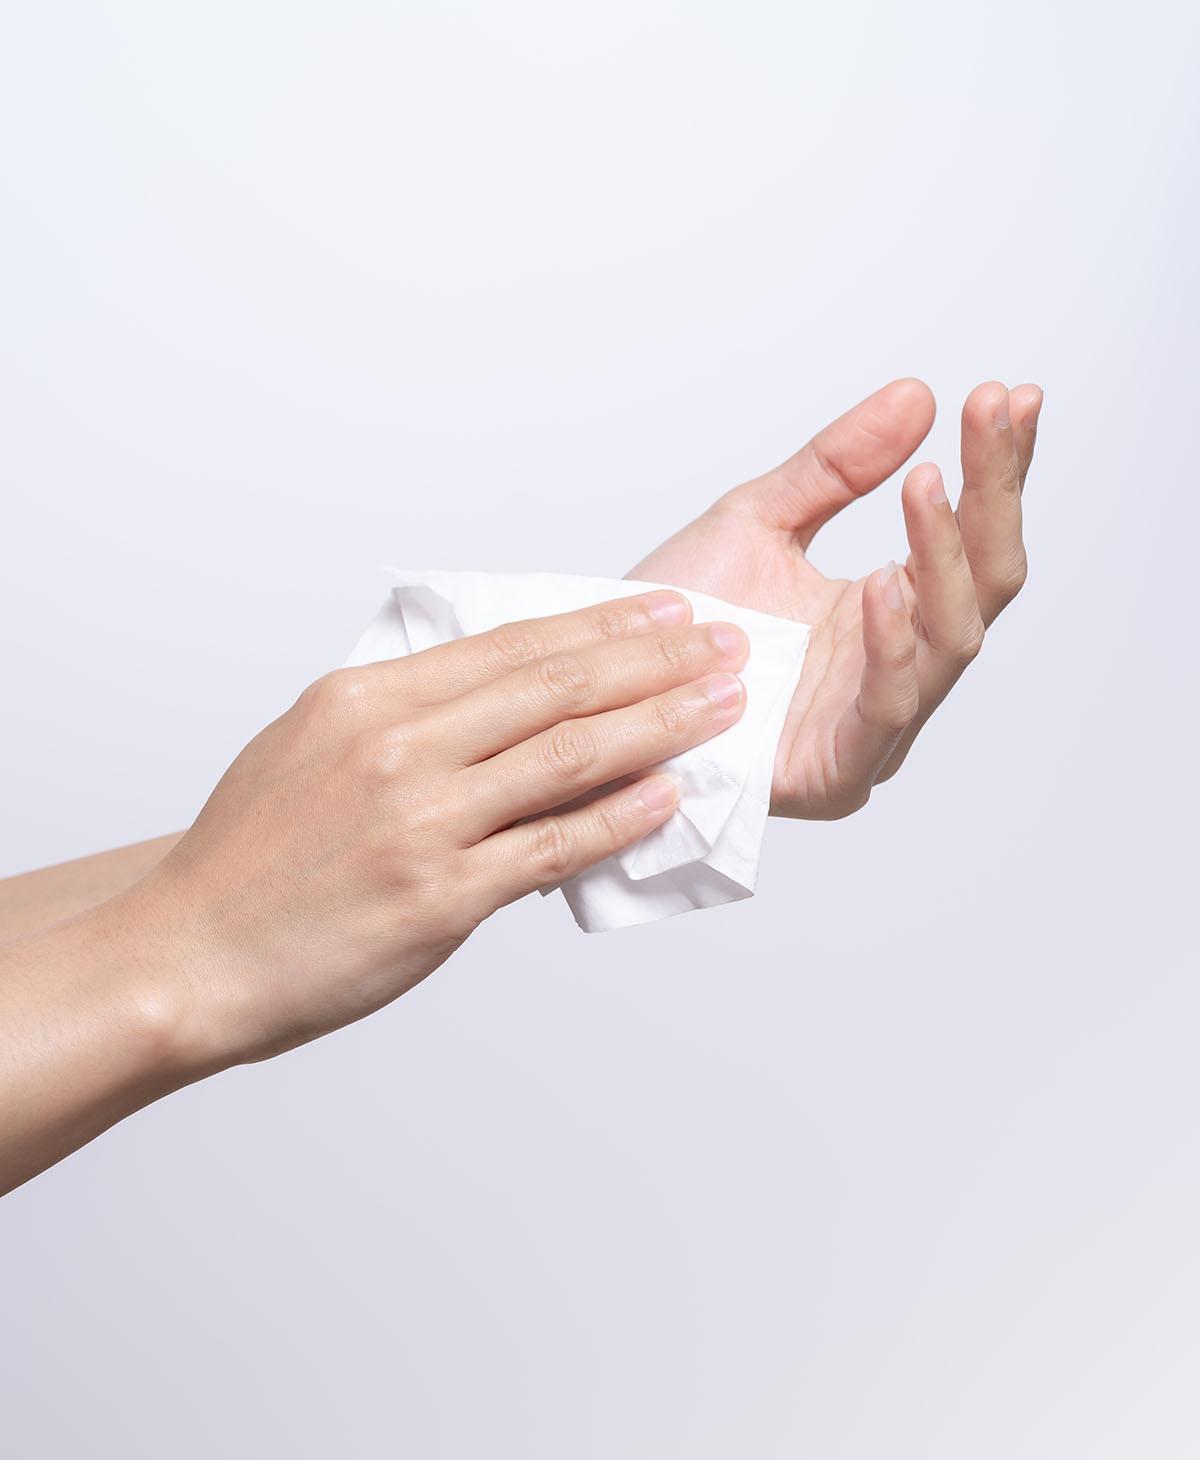 Lamiderm producten Lamiderm® Protect